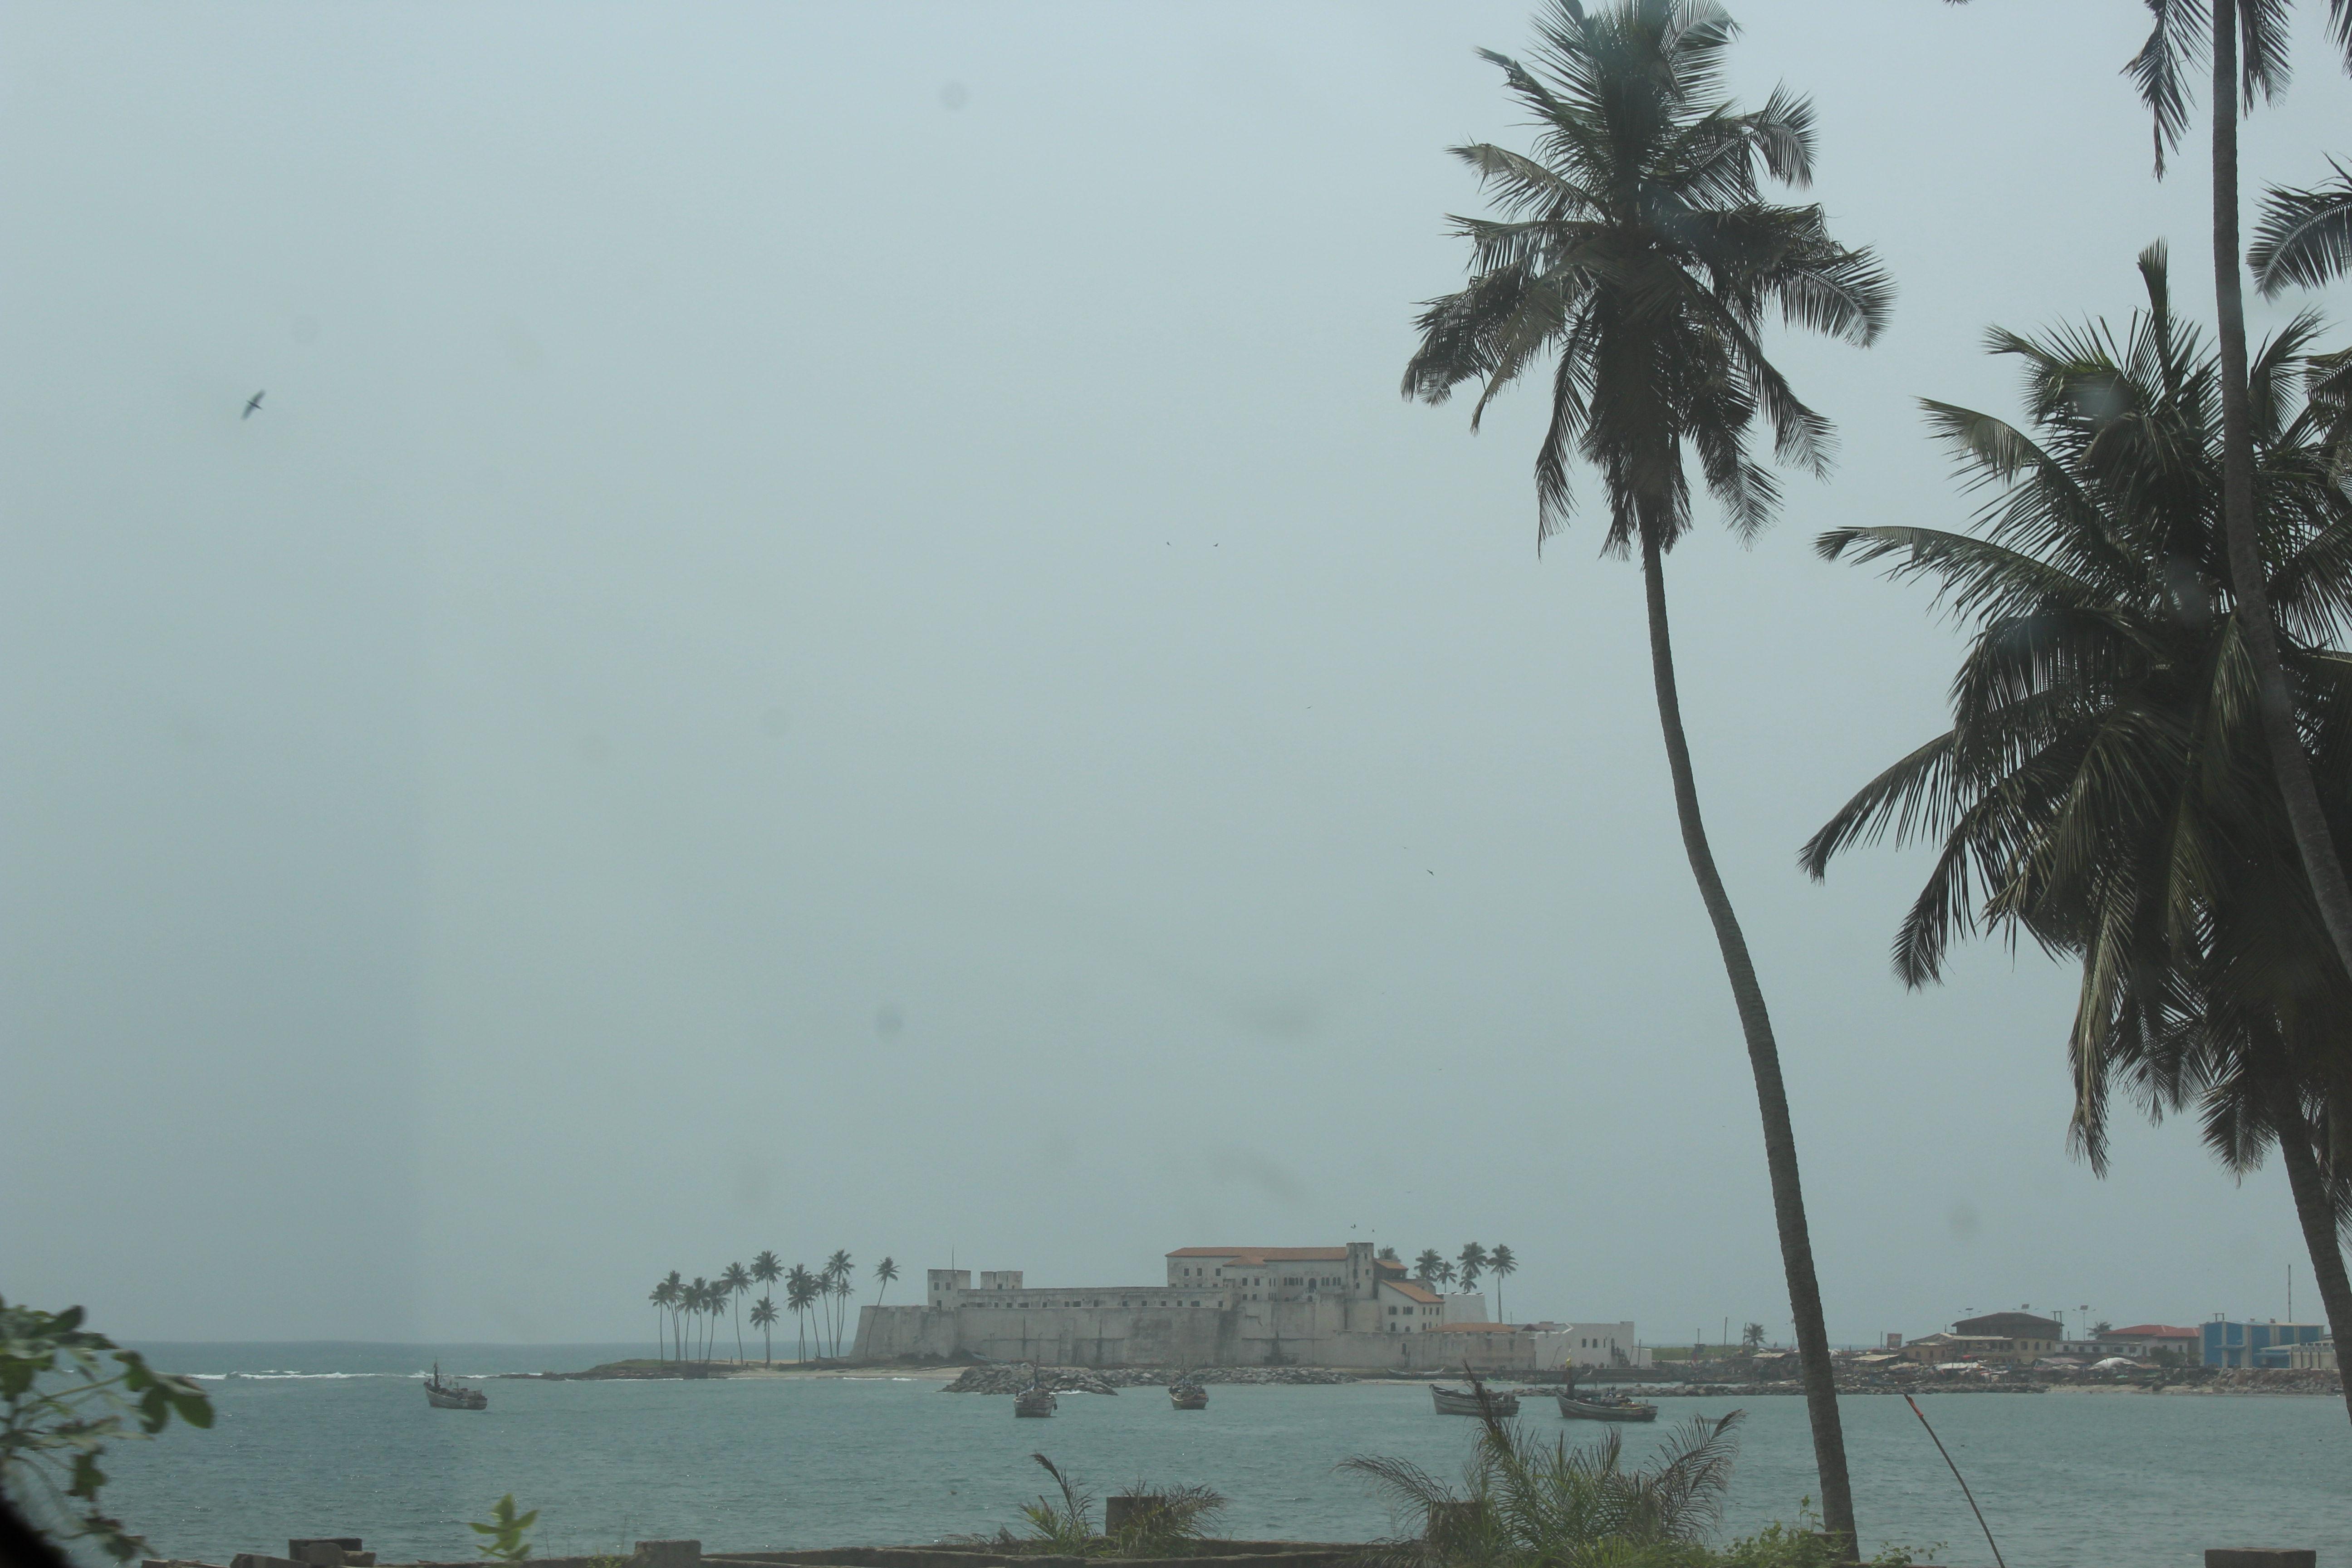 Elmina castle from a distance